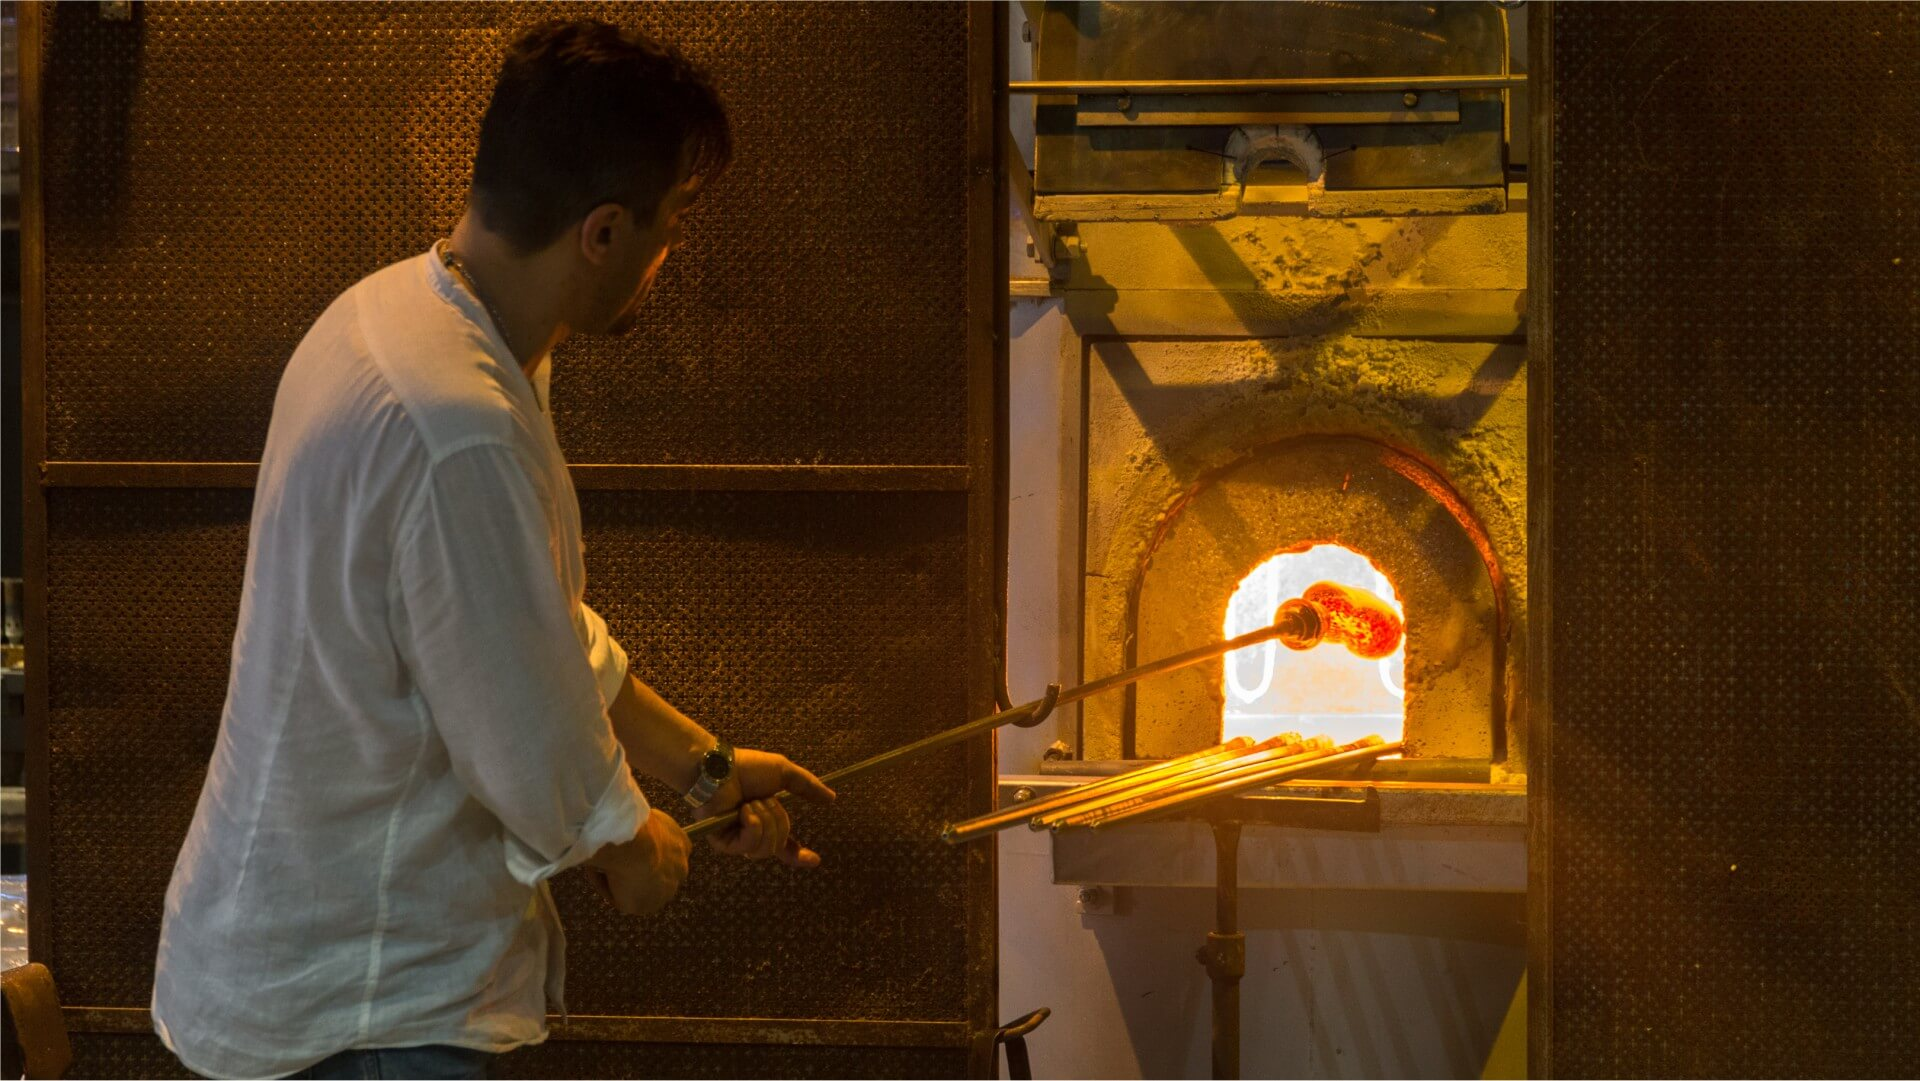 Am Glasofen auf Murano